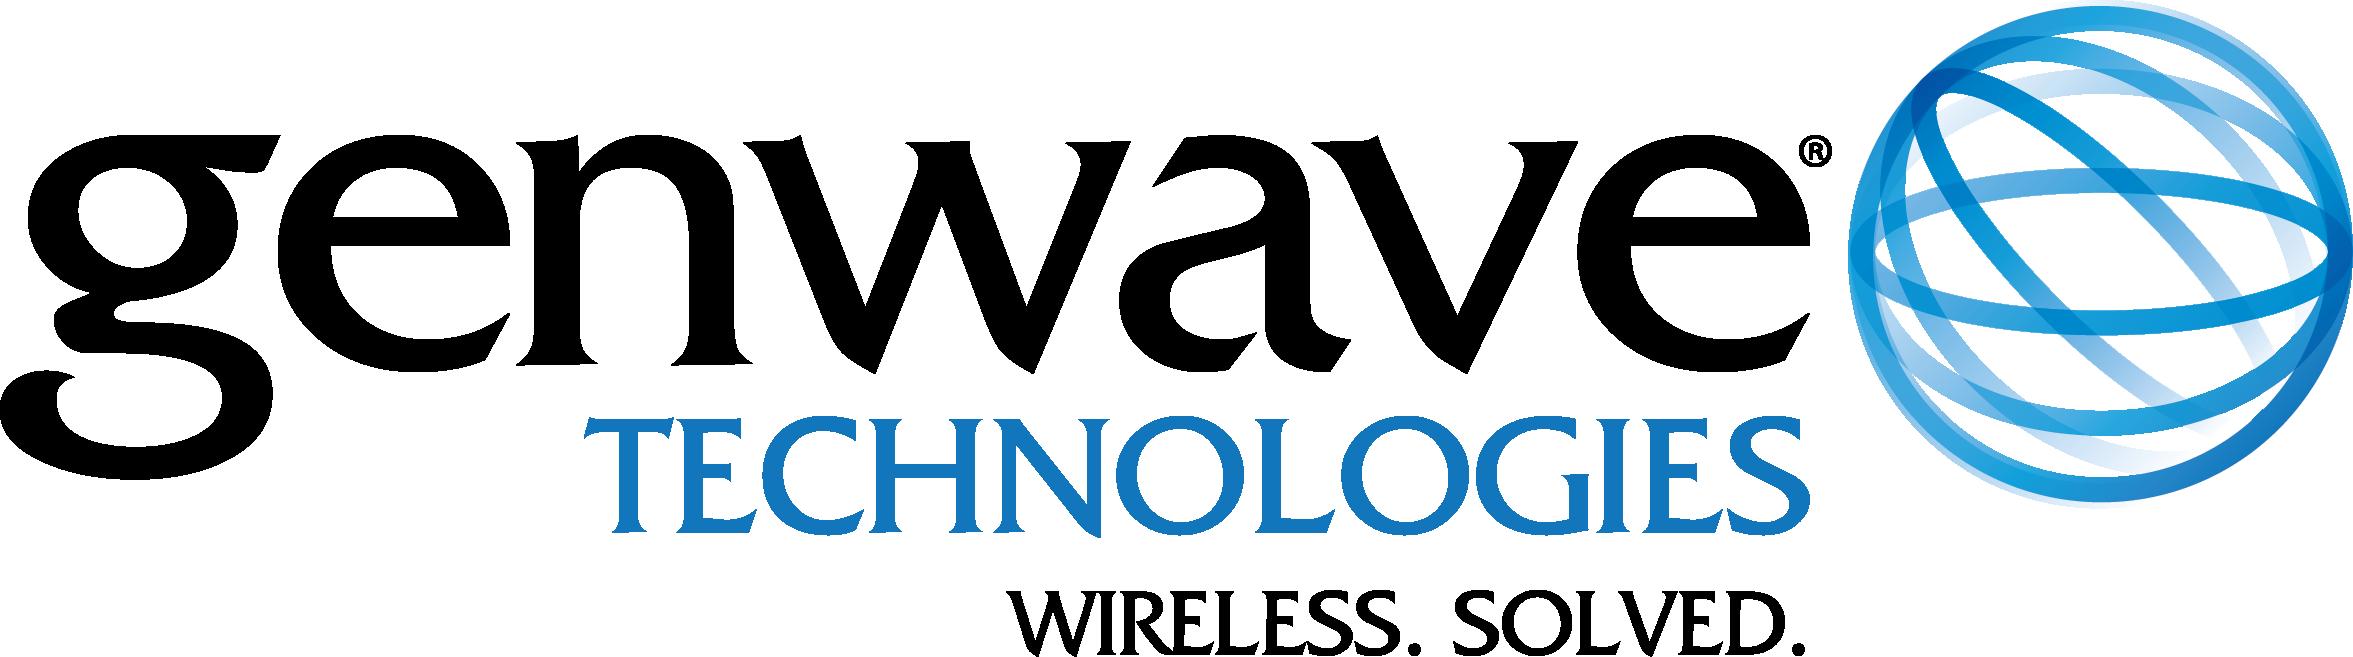 Genwave Technologies Inc.